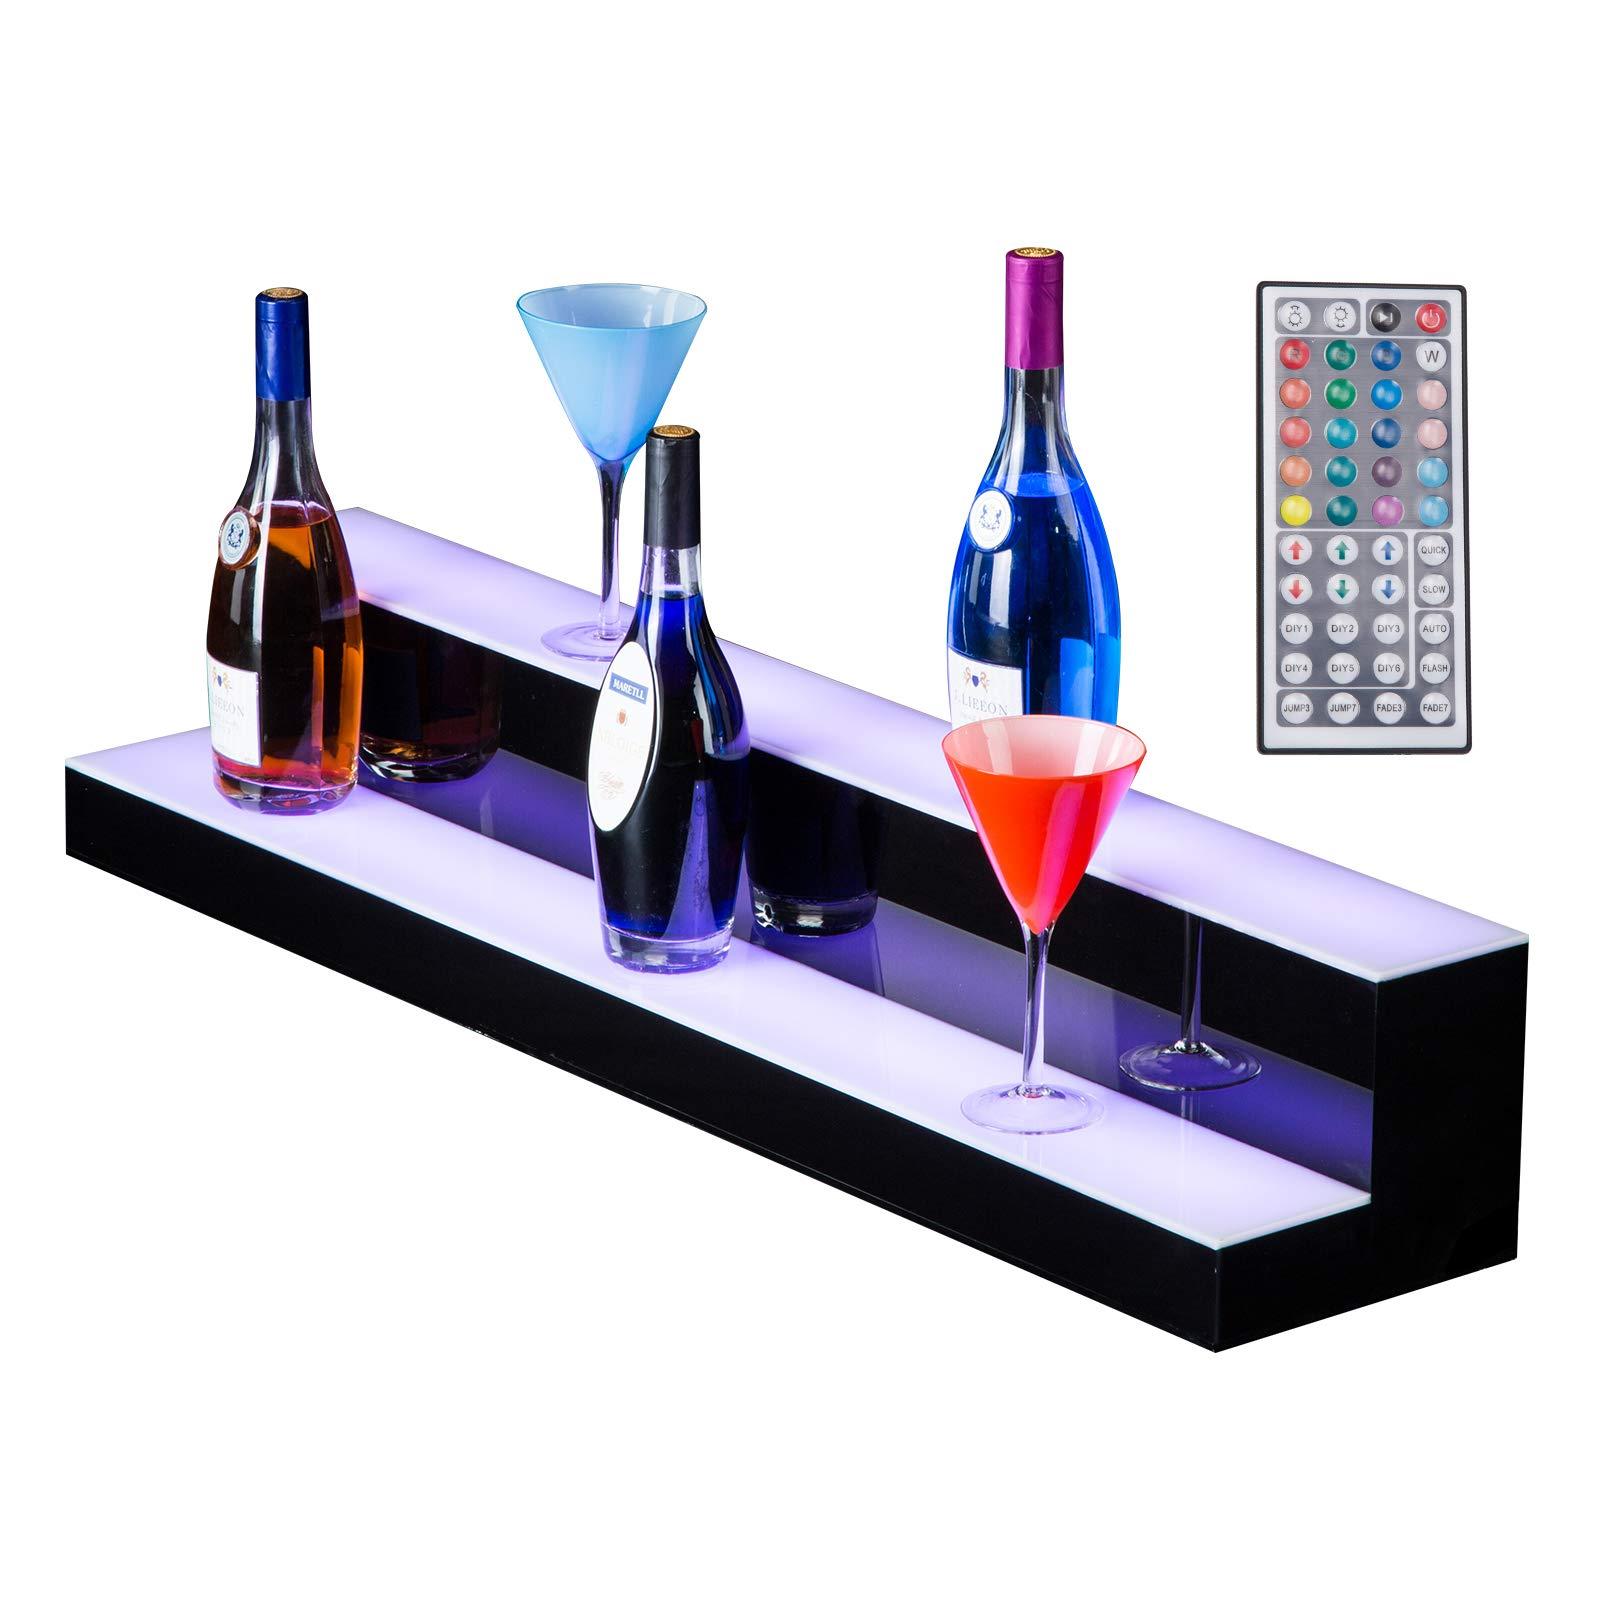 SUNCOO LED Lighted Liquor Bottle Display 40'' 2 Step Illuminated Bottle Shelf 2 Tier Home Bar Drinks Lighting Shelves with Remote Control